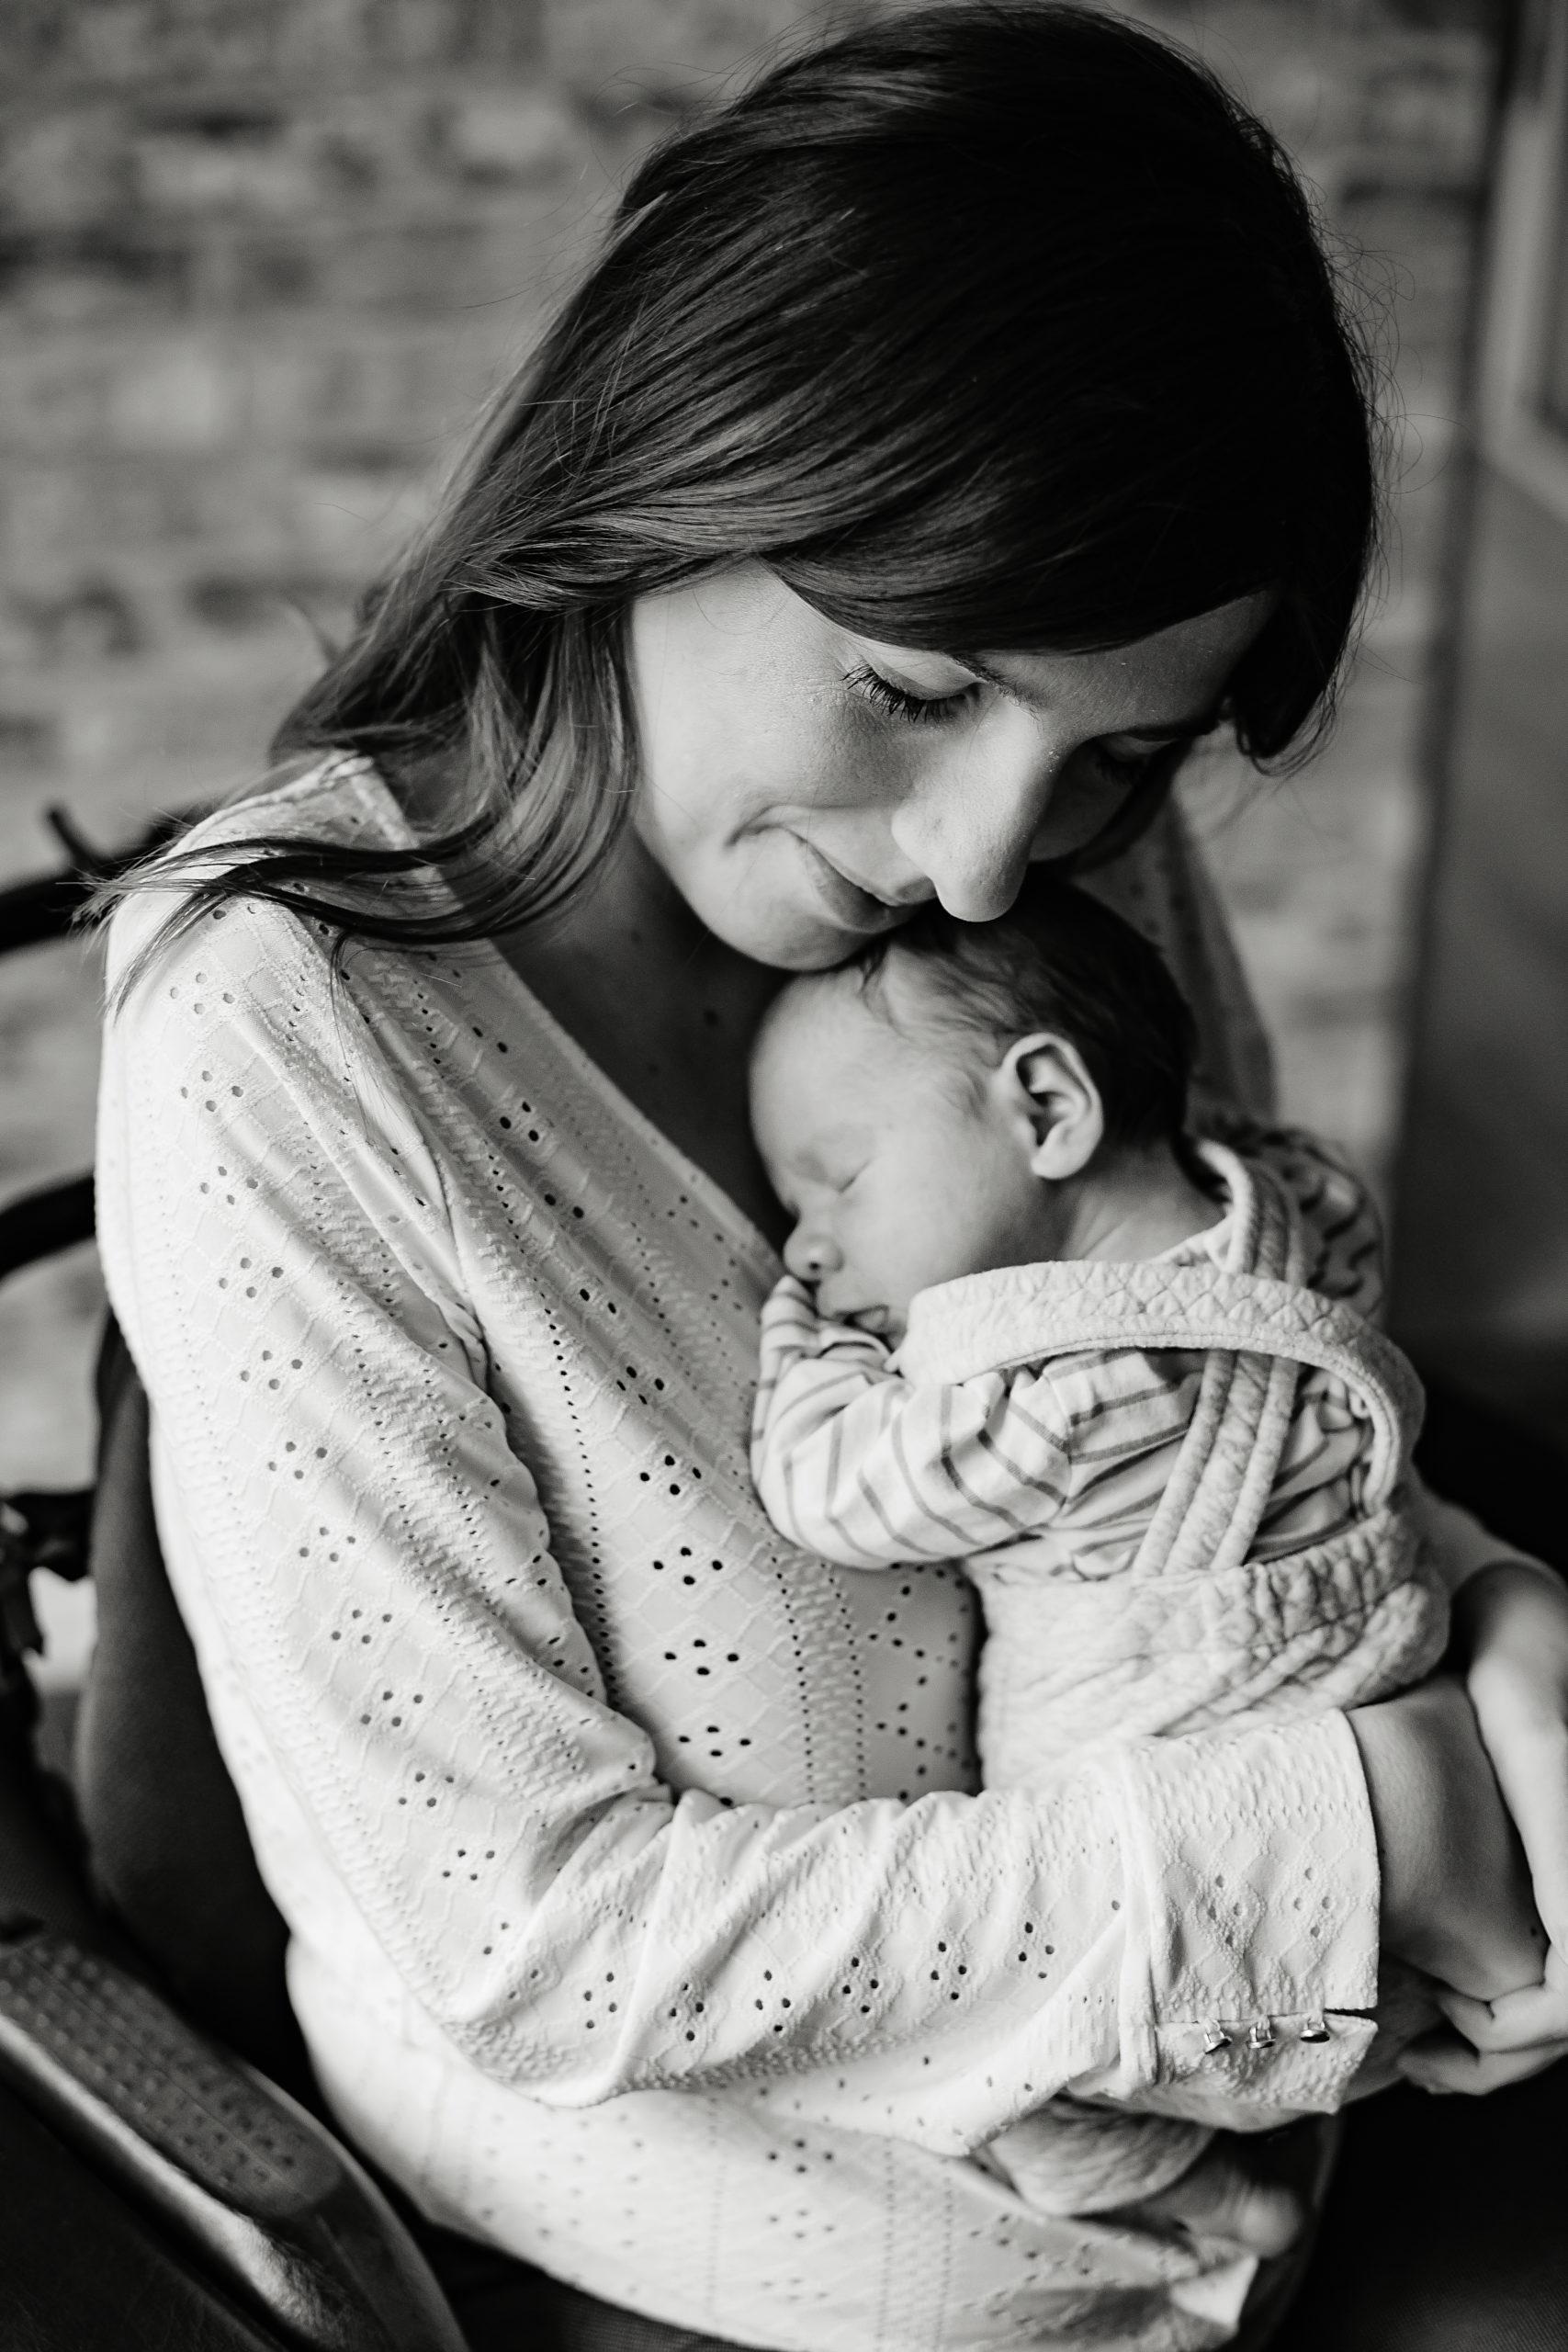 Etre mère malgré la maladie